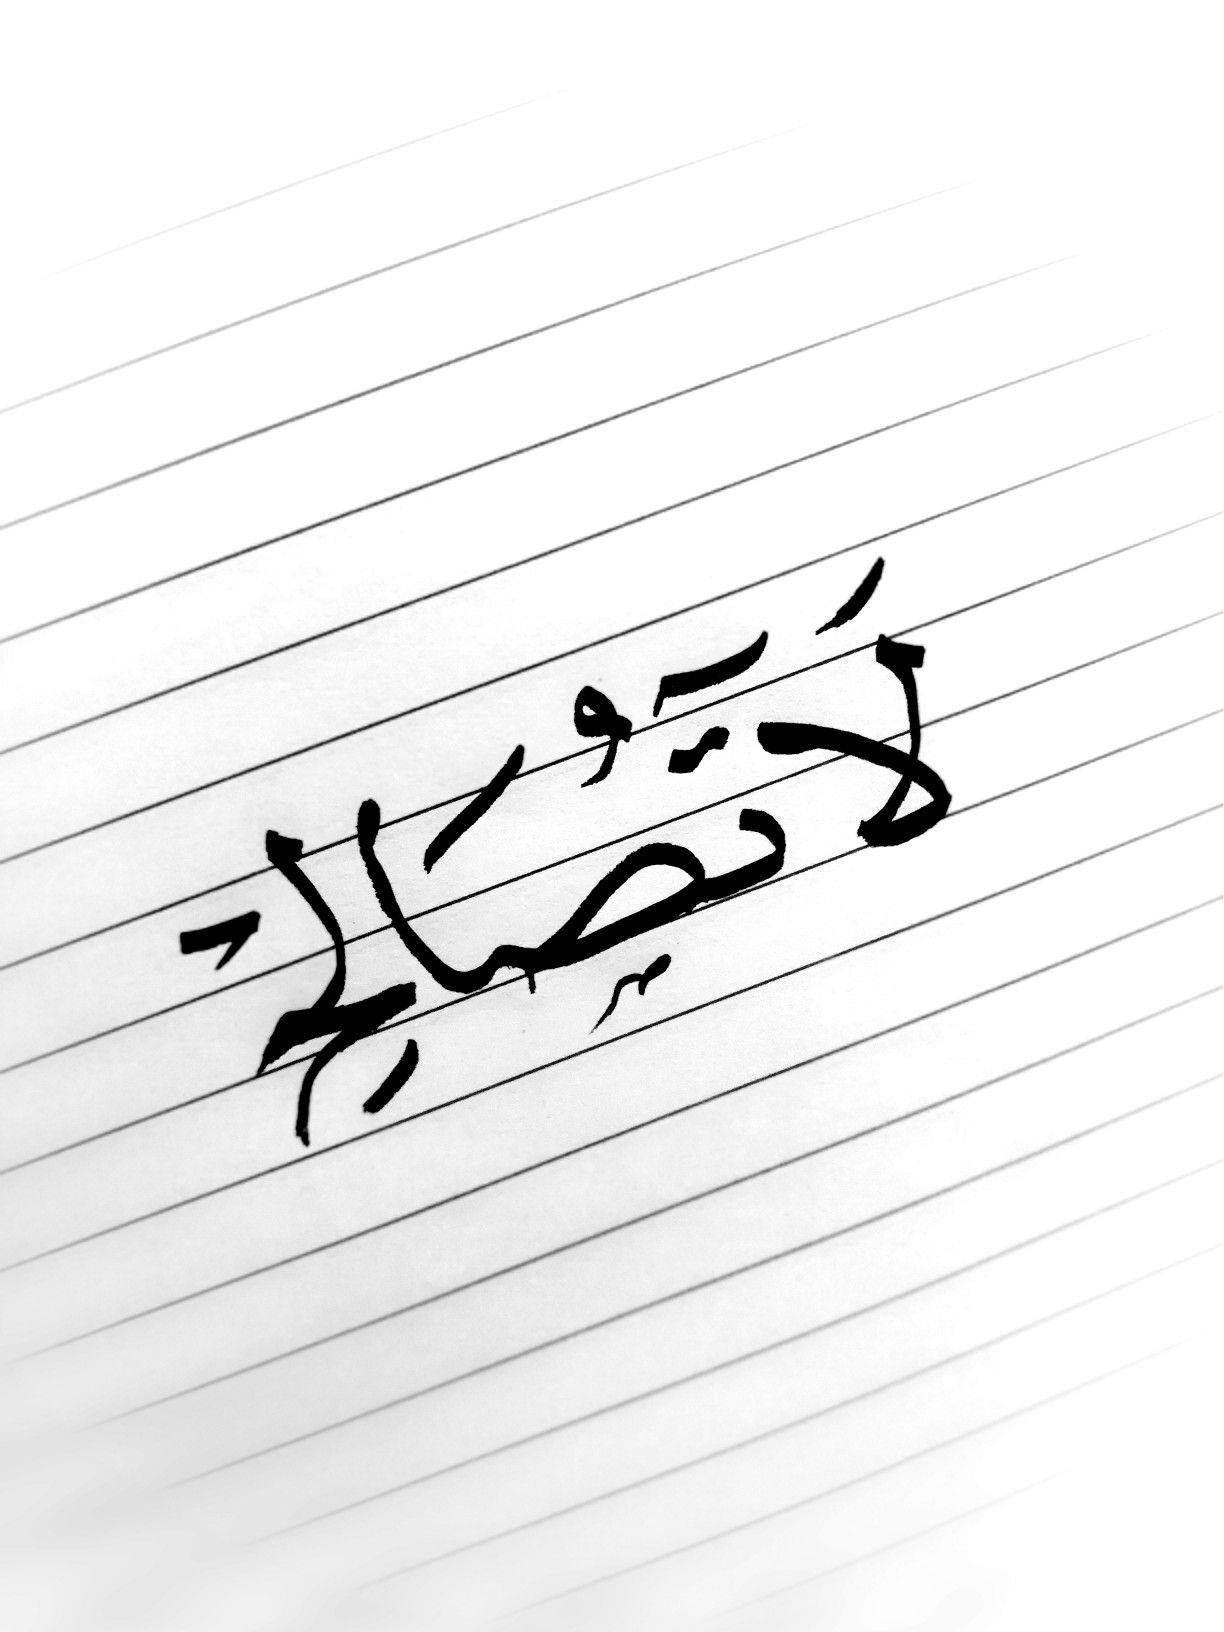 لا تصالح فوق كرامتك Arabic Calligraphy Writing Calligraphy